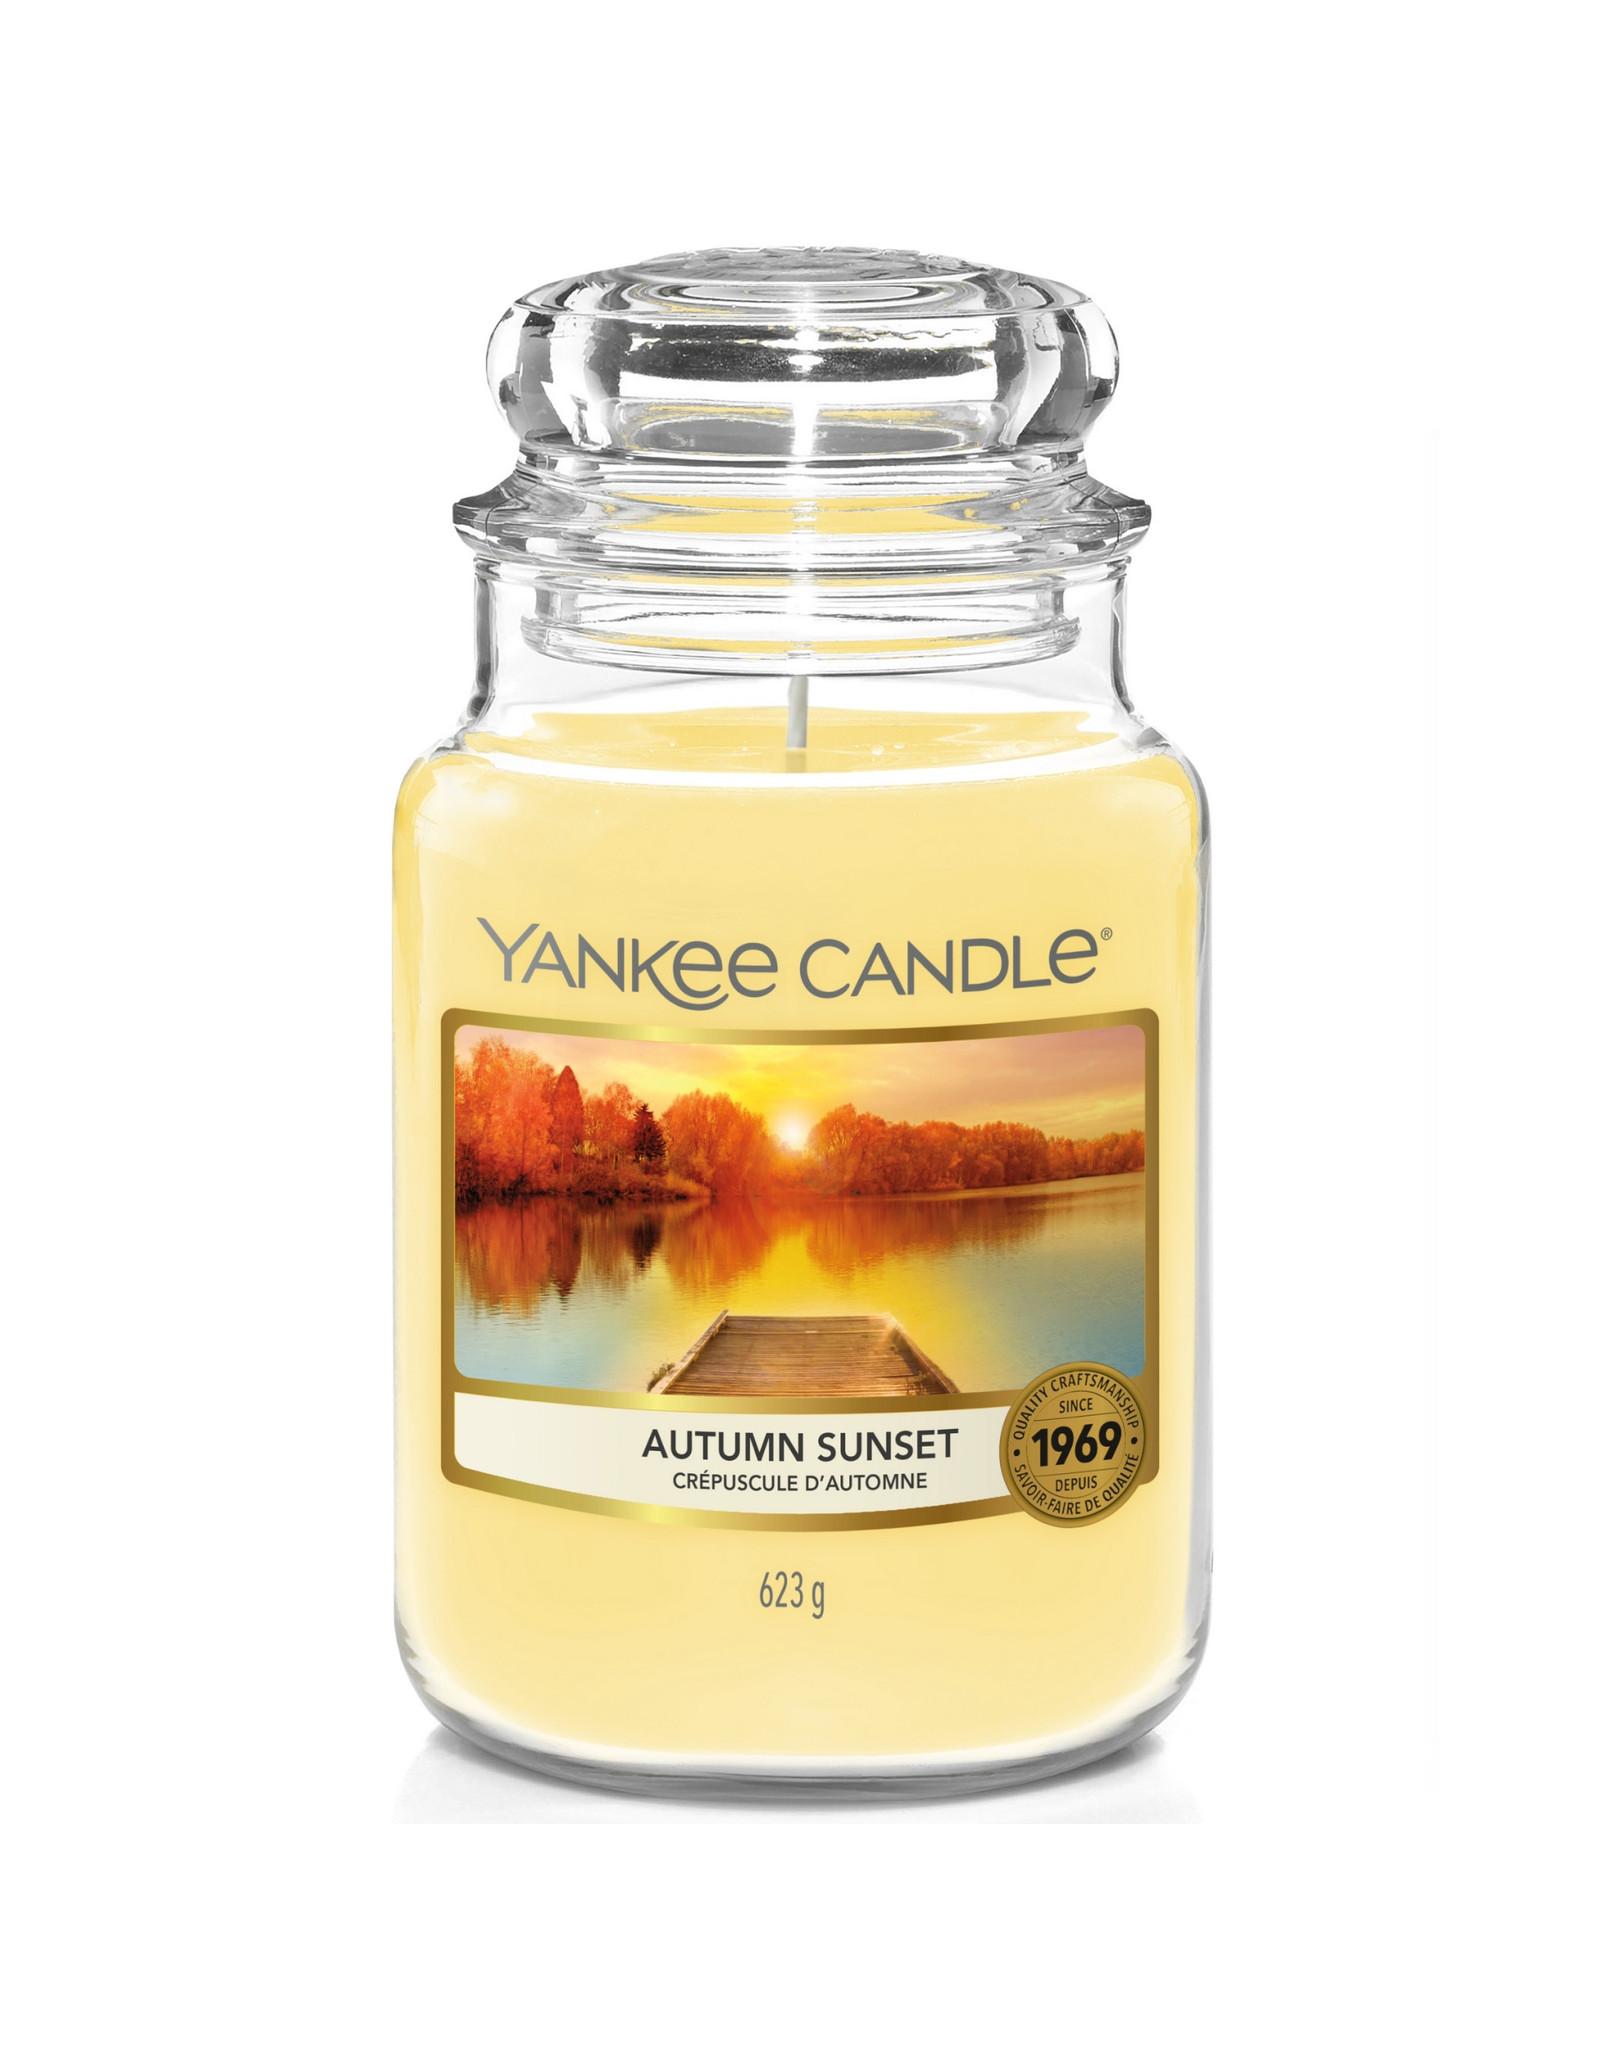 Yankee Candle Autumn Sunset - Large Jar